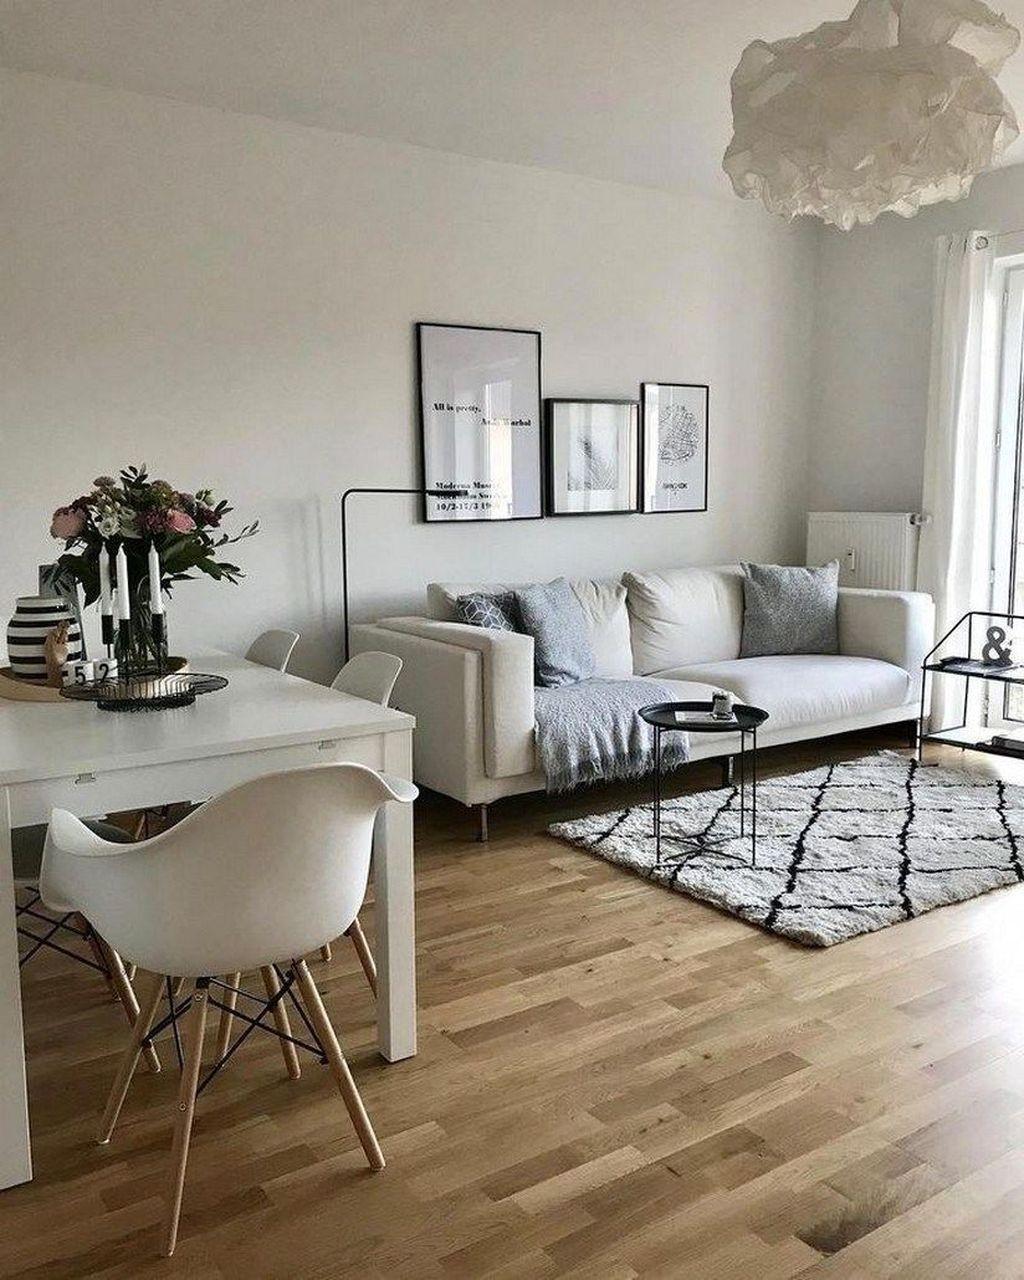 32 Brilliant Small Apartment Decorating Ideas You Need To Try Homyhomee Small Apartment Decorating Living Room Living Room Decor Apartment Small Apartment Living Room